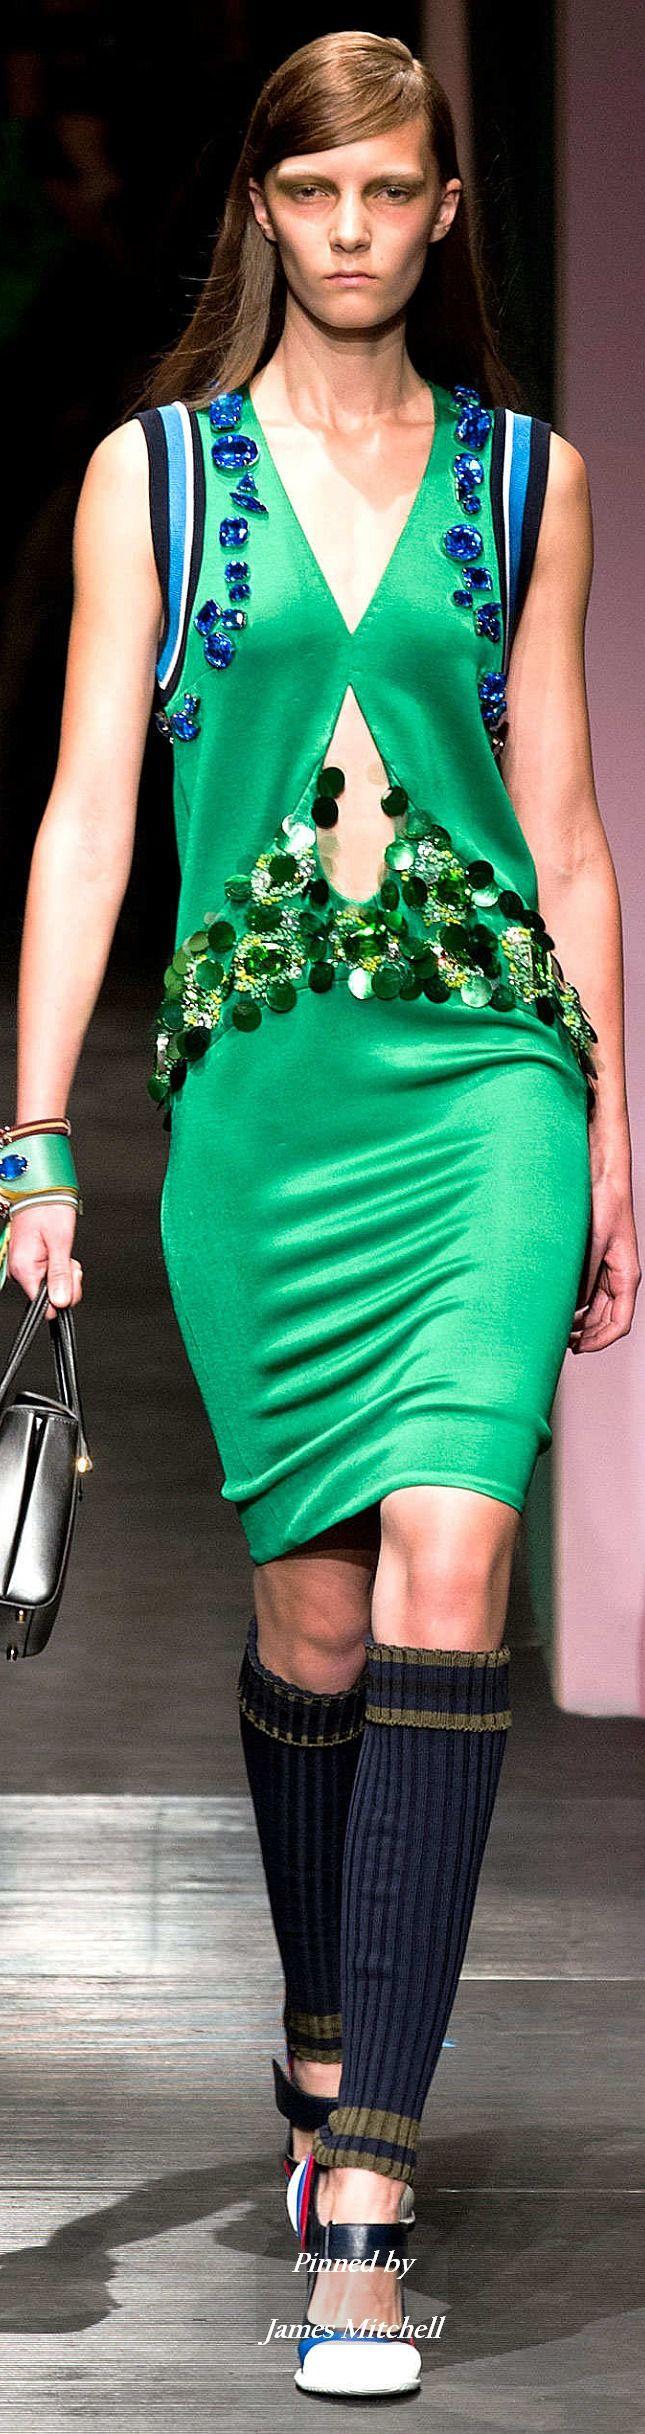 Prada Collection Spring 2014 Ready-to-Wear